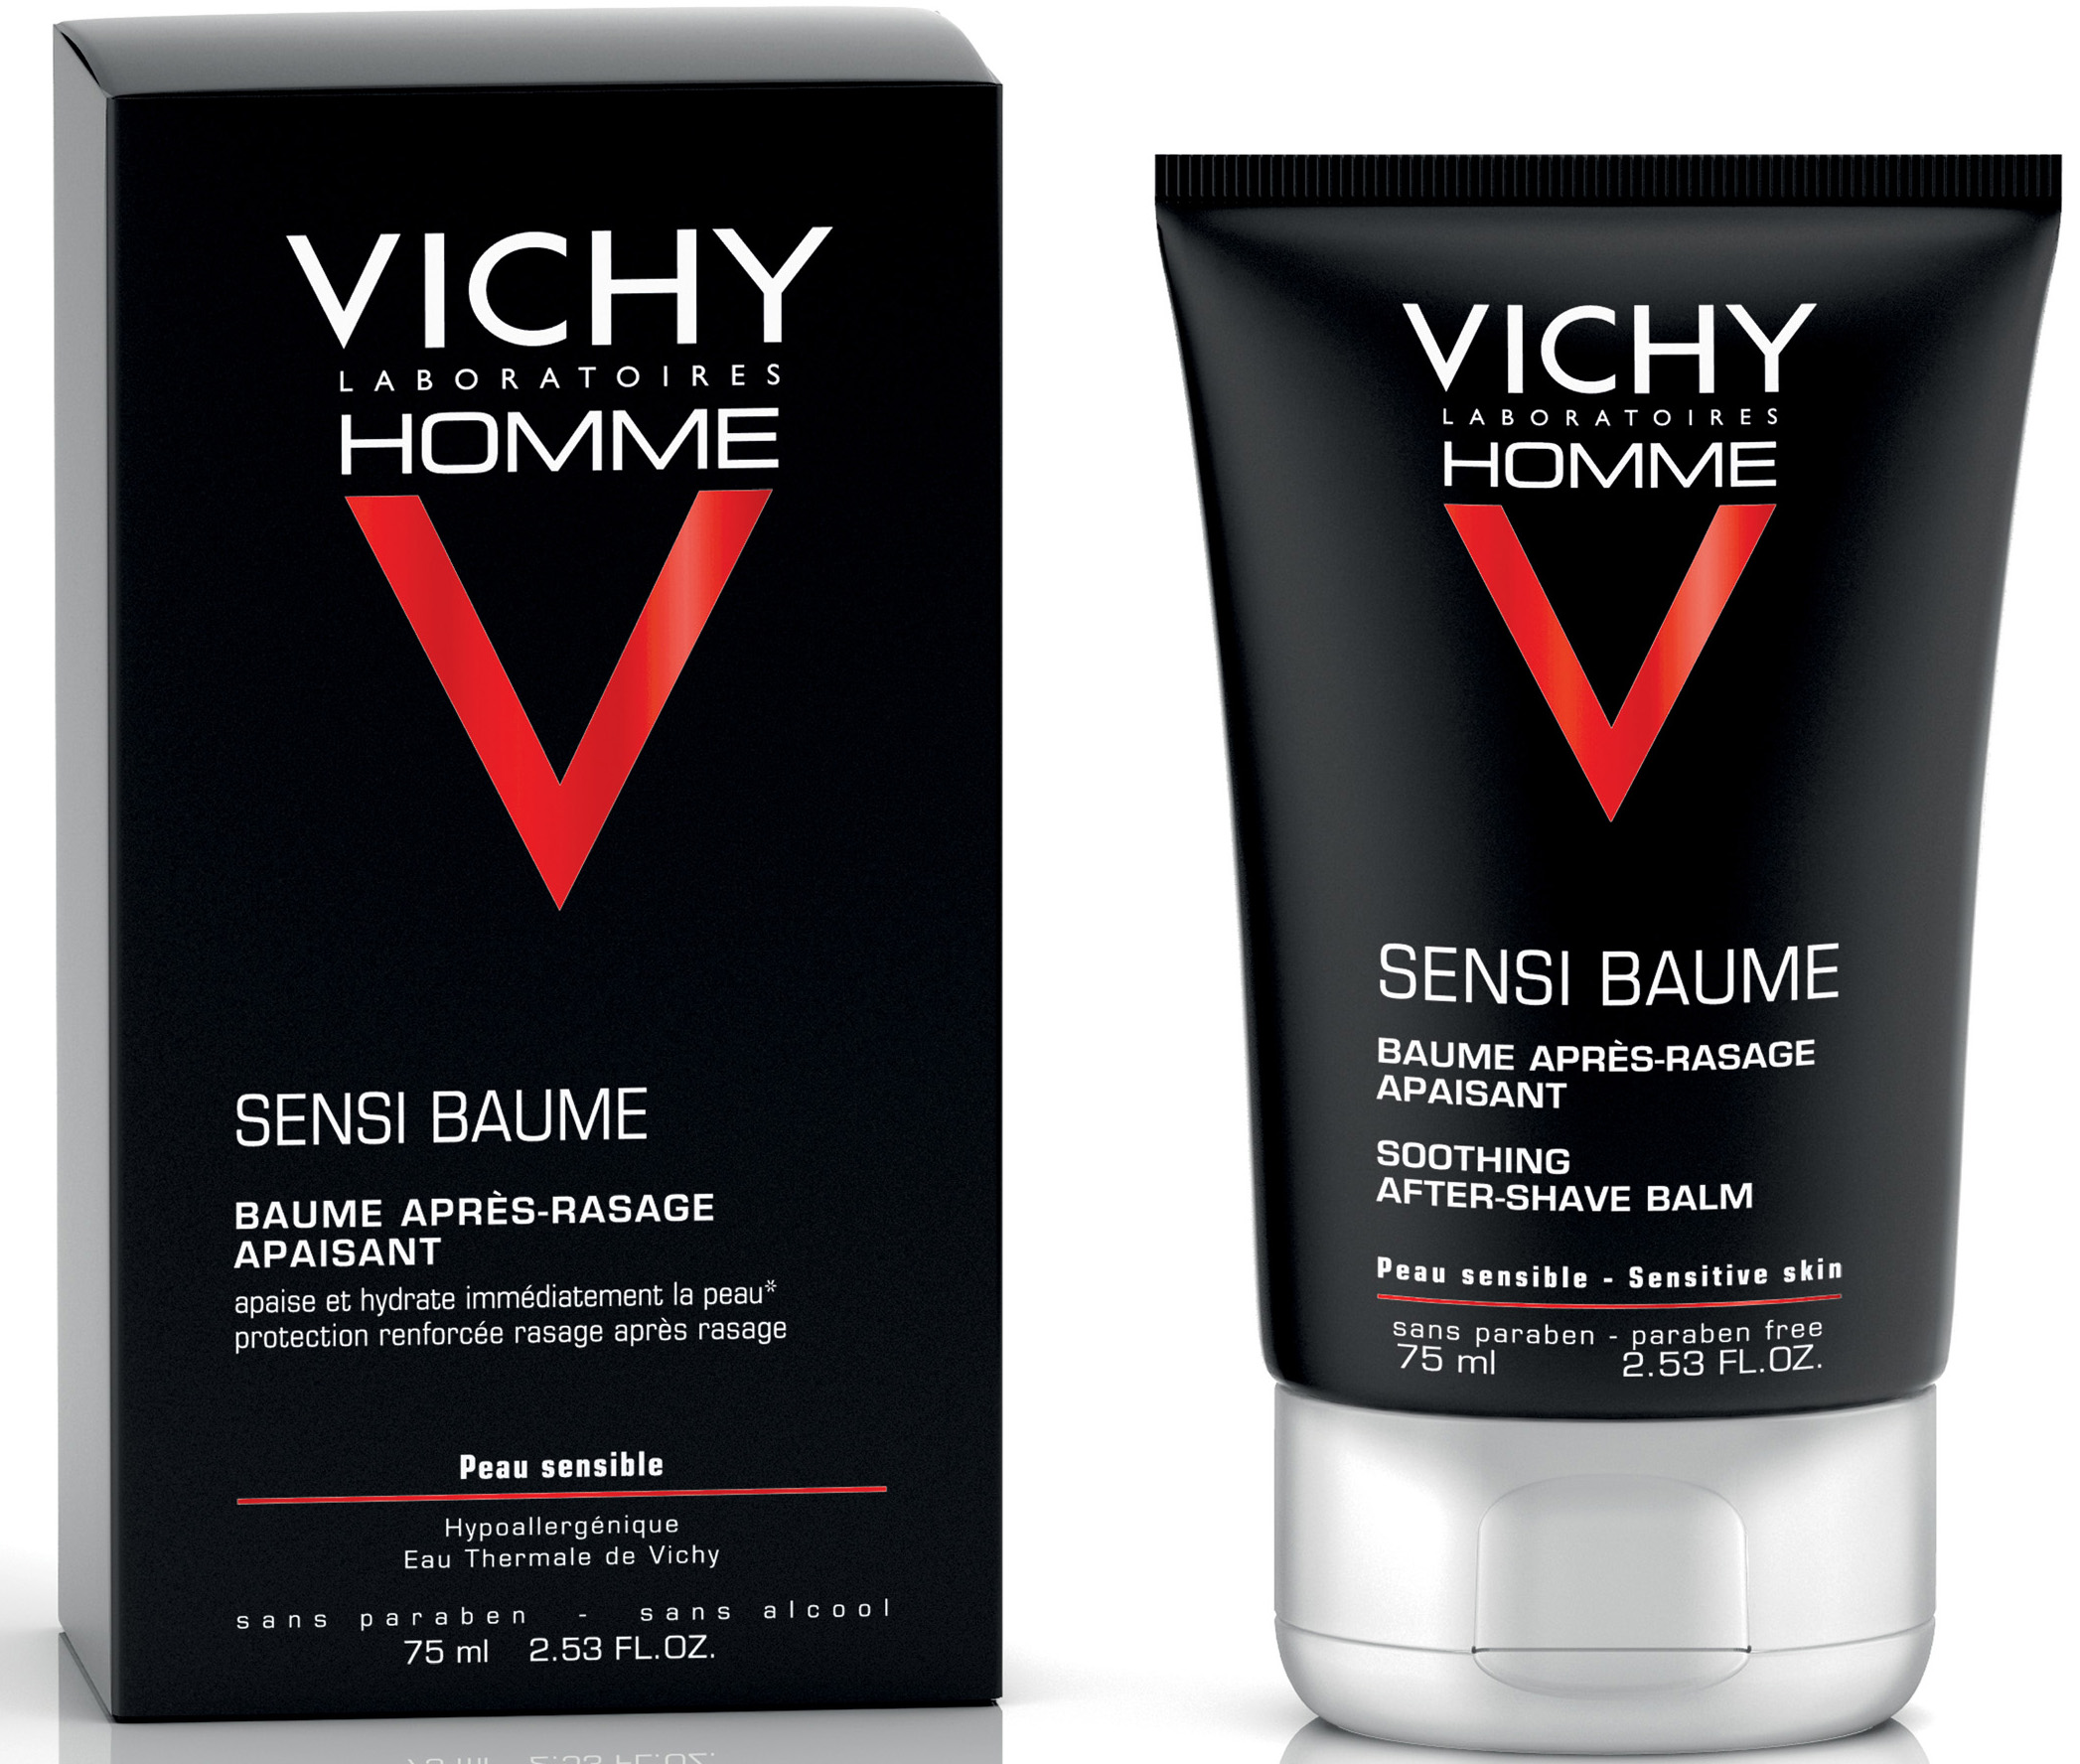 Vichy Homme Sensi Baume After Shave Balm Για Άνδρες Με Ευαίσθητη Επιδερμίδα 75ml